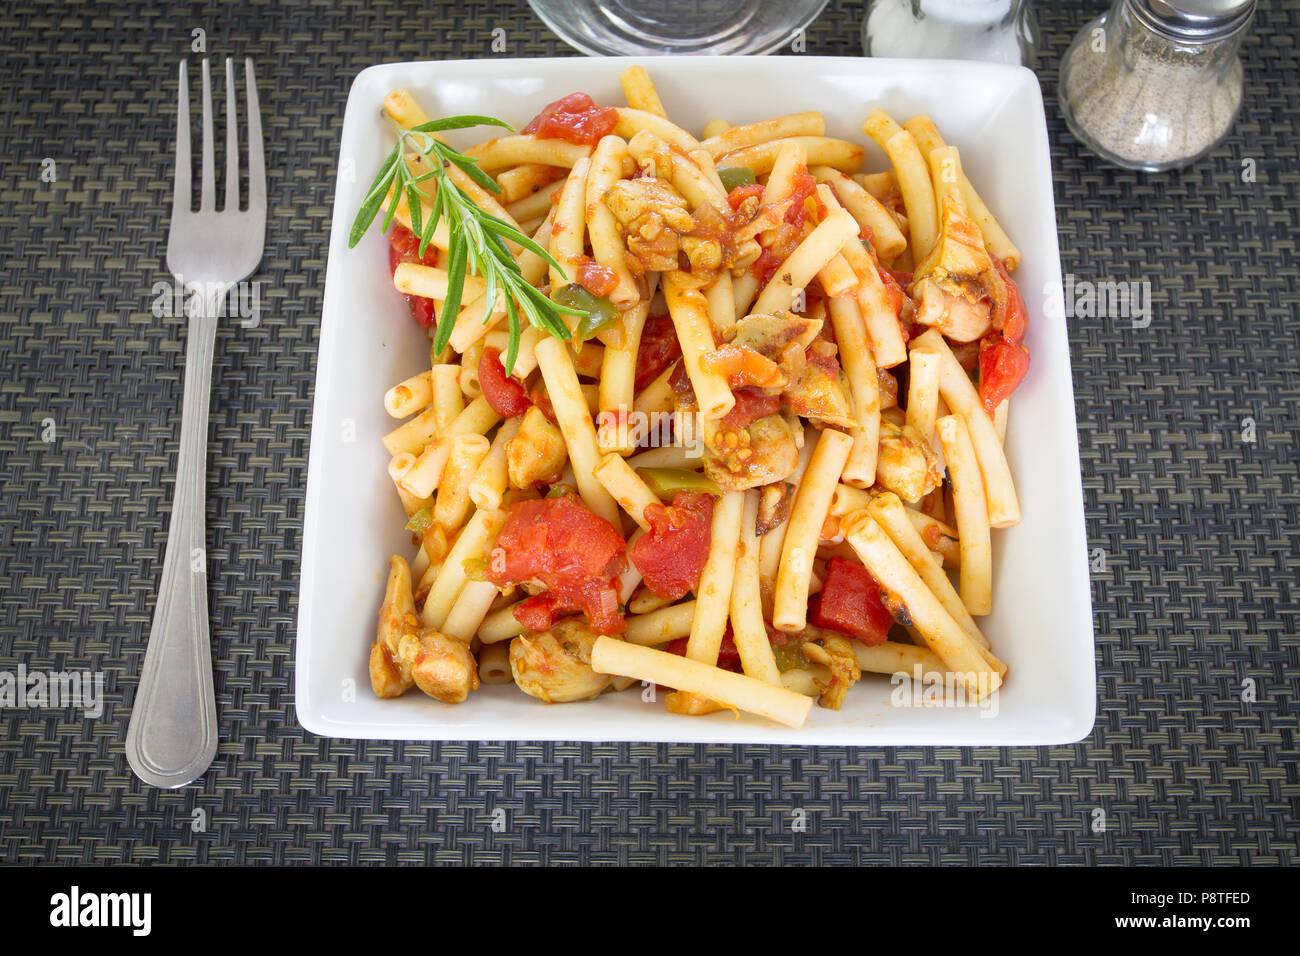 Sautéed pork and Provencal pasta - Stock Image